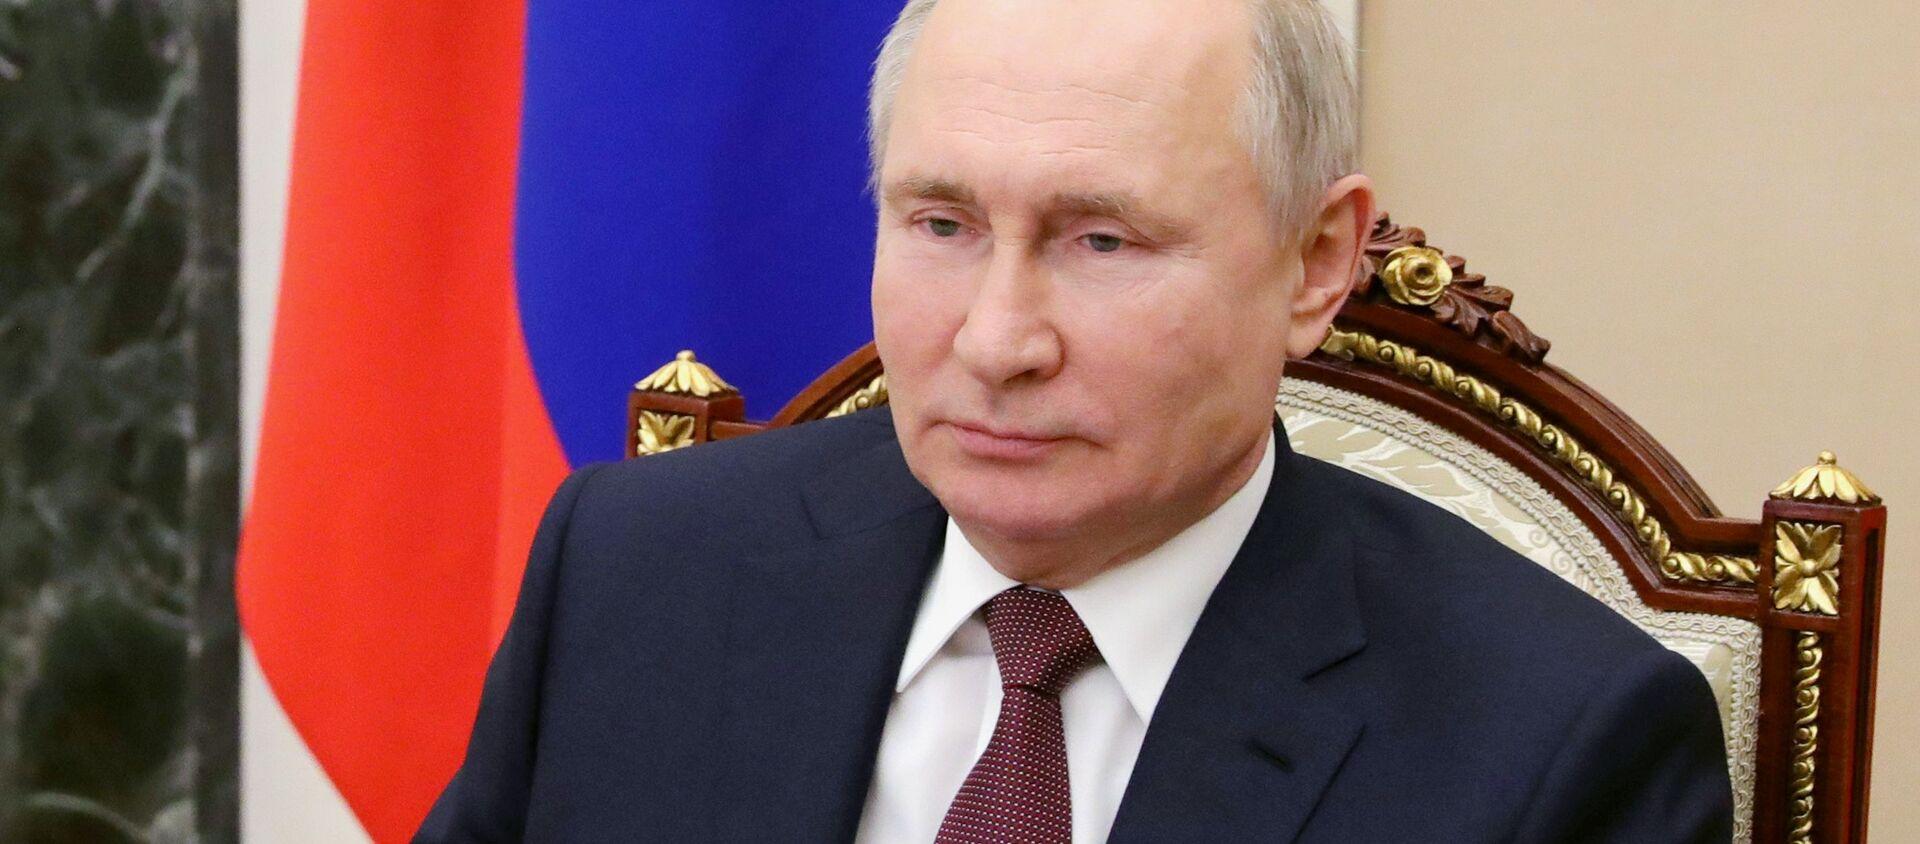 Владимир Путин - Sputnik Грузия, 1920, 08.02.2021